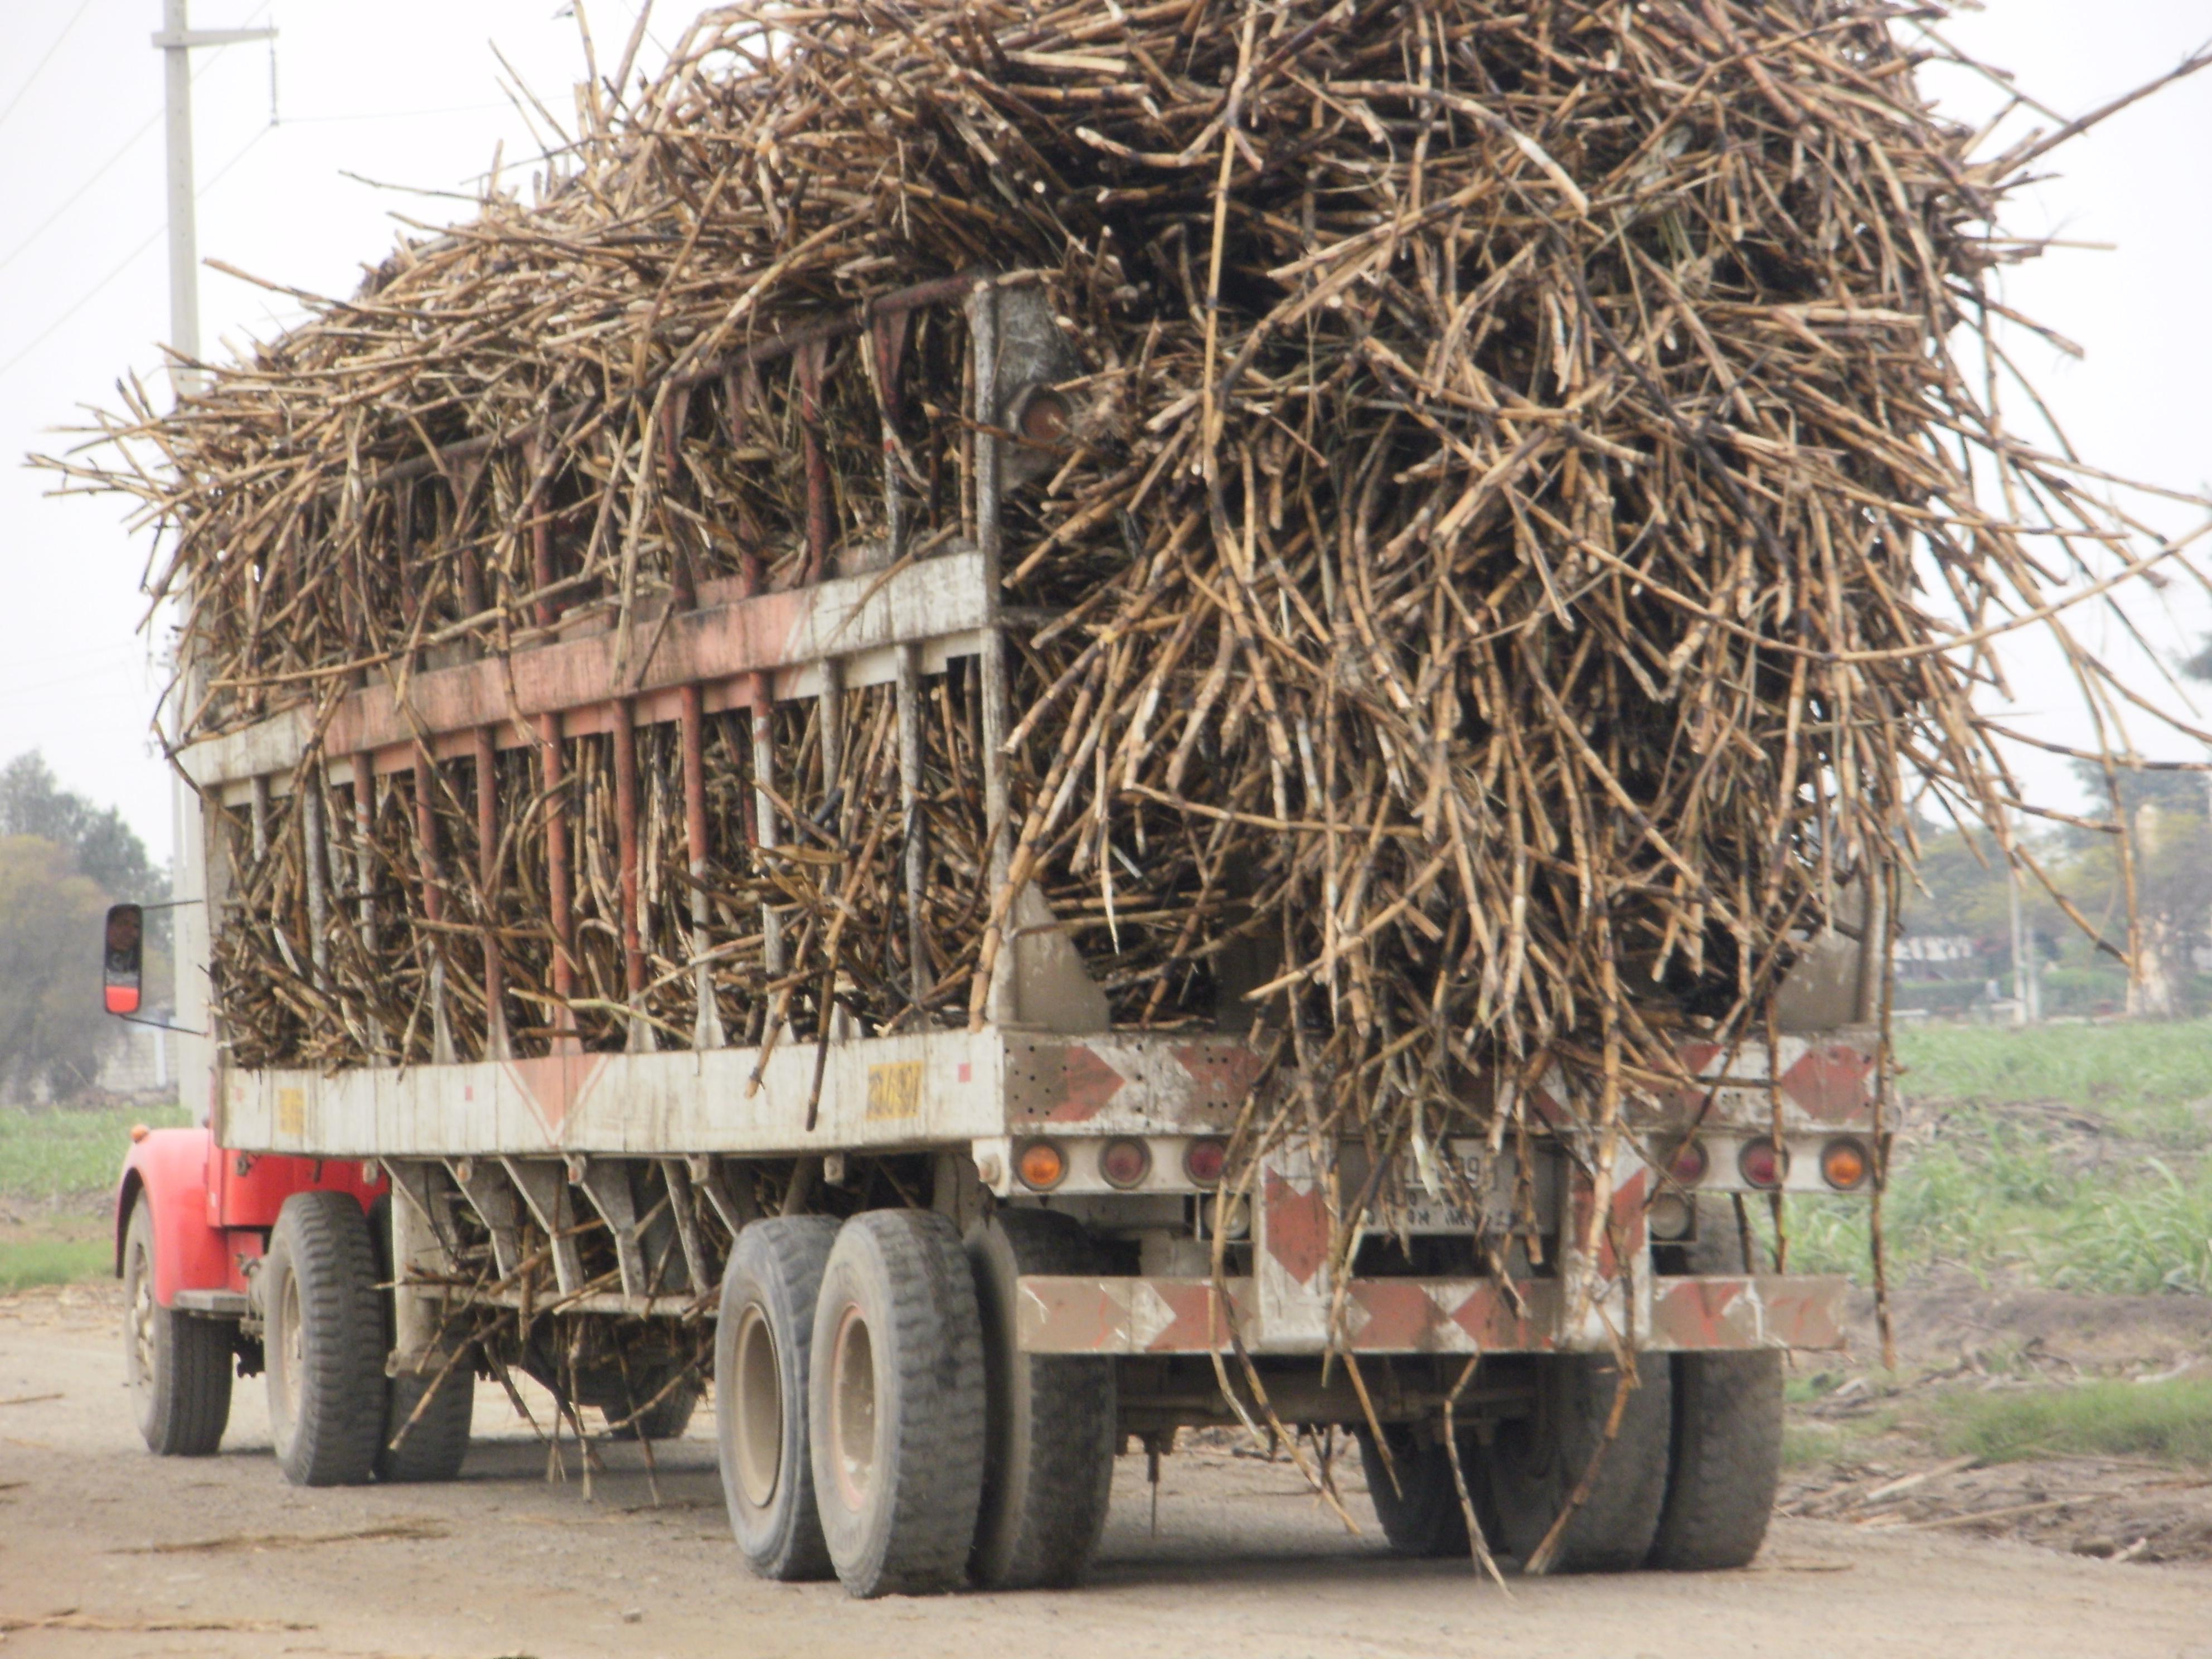 Hacienda transport, circa 2010